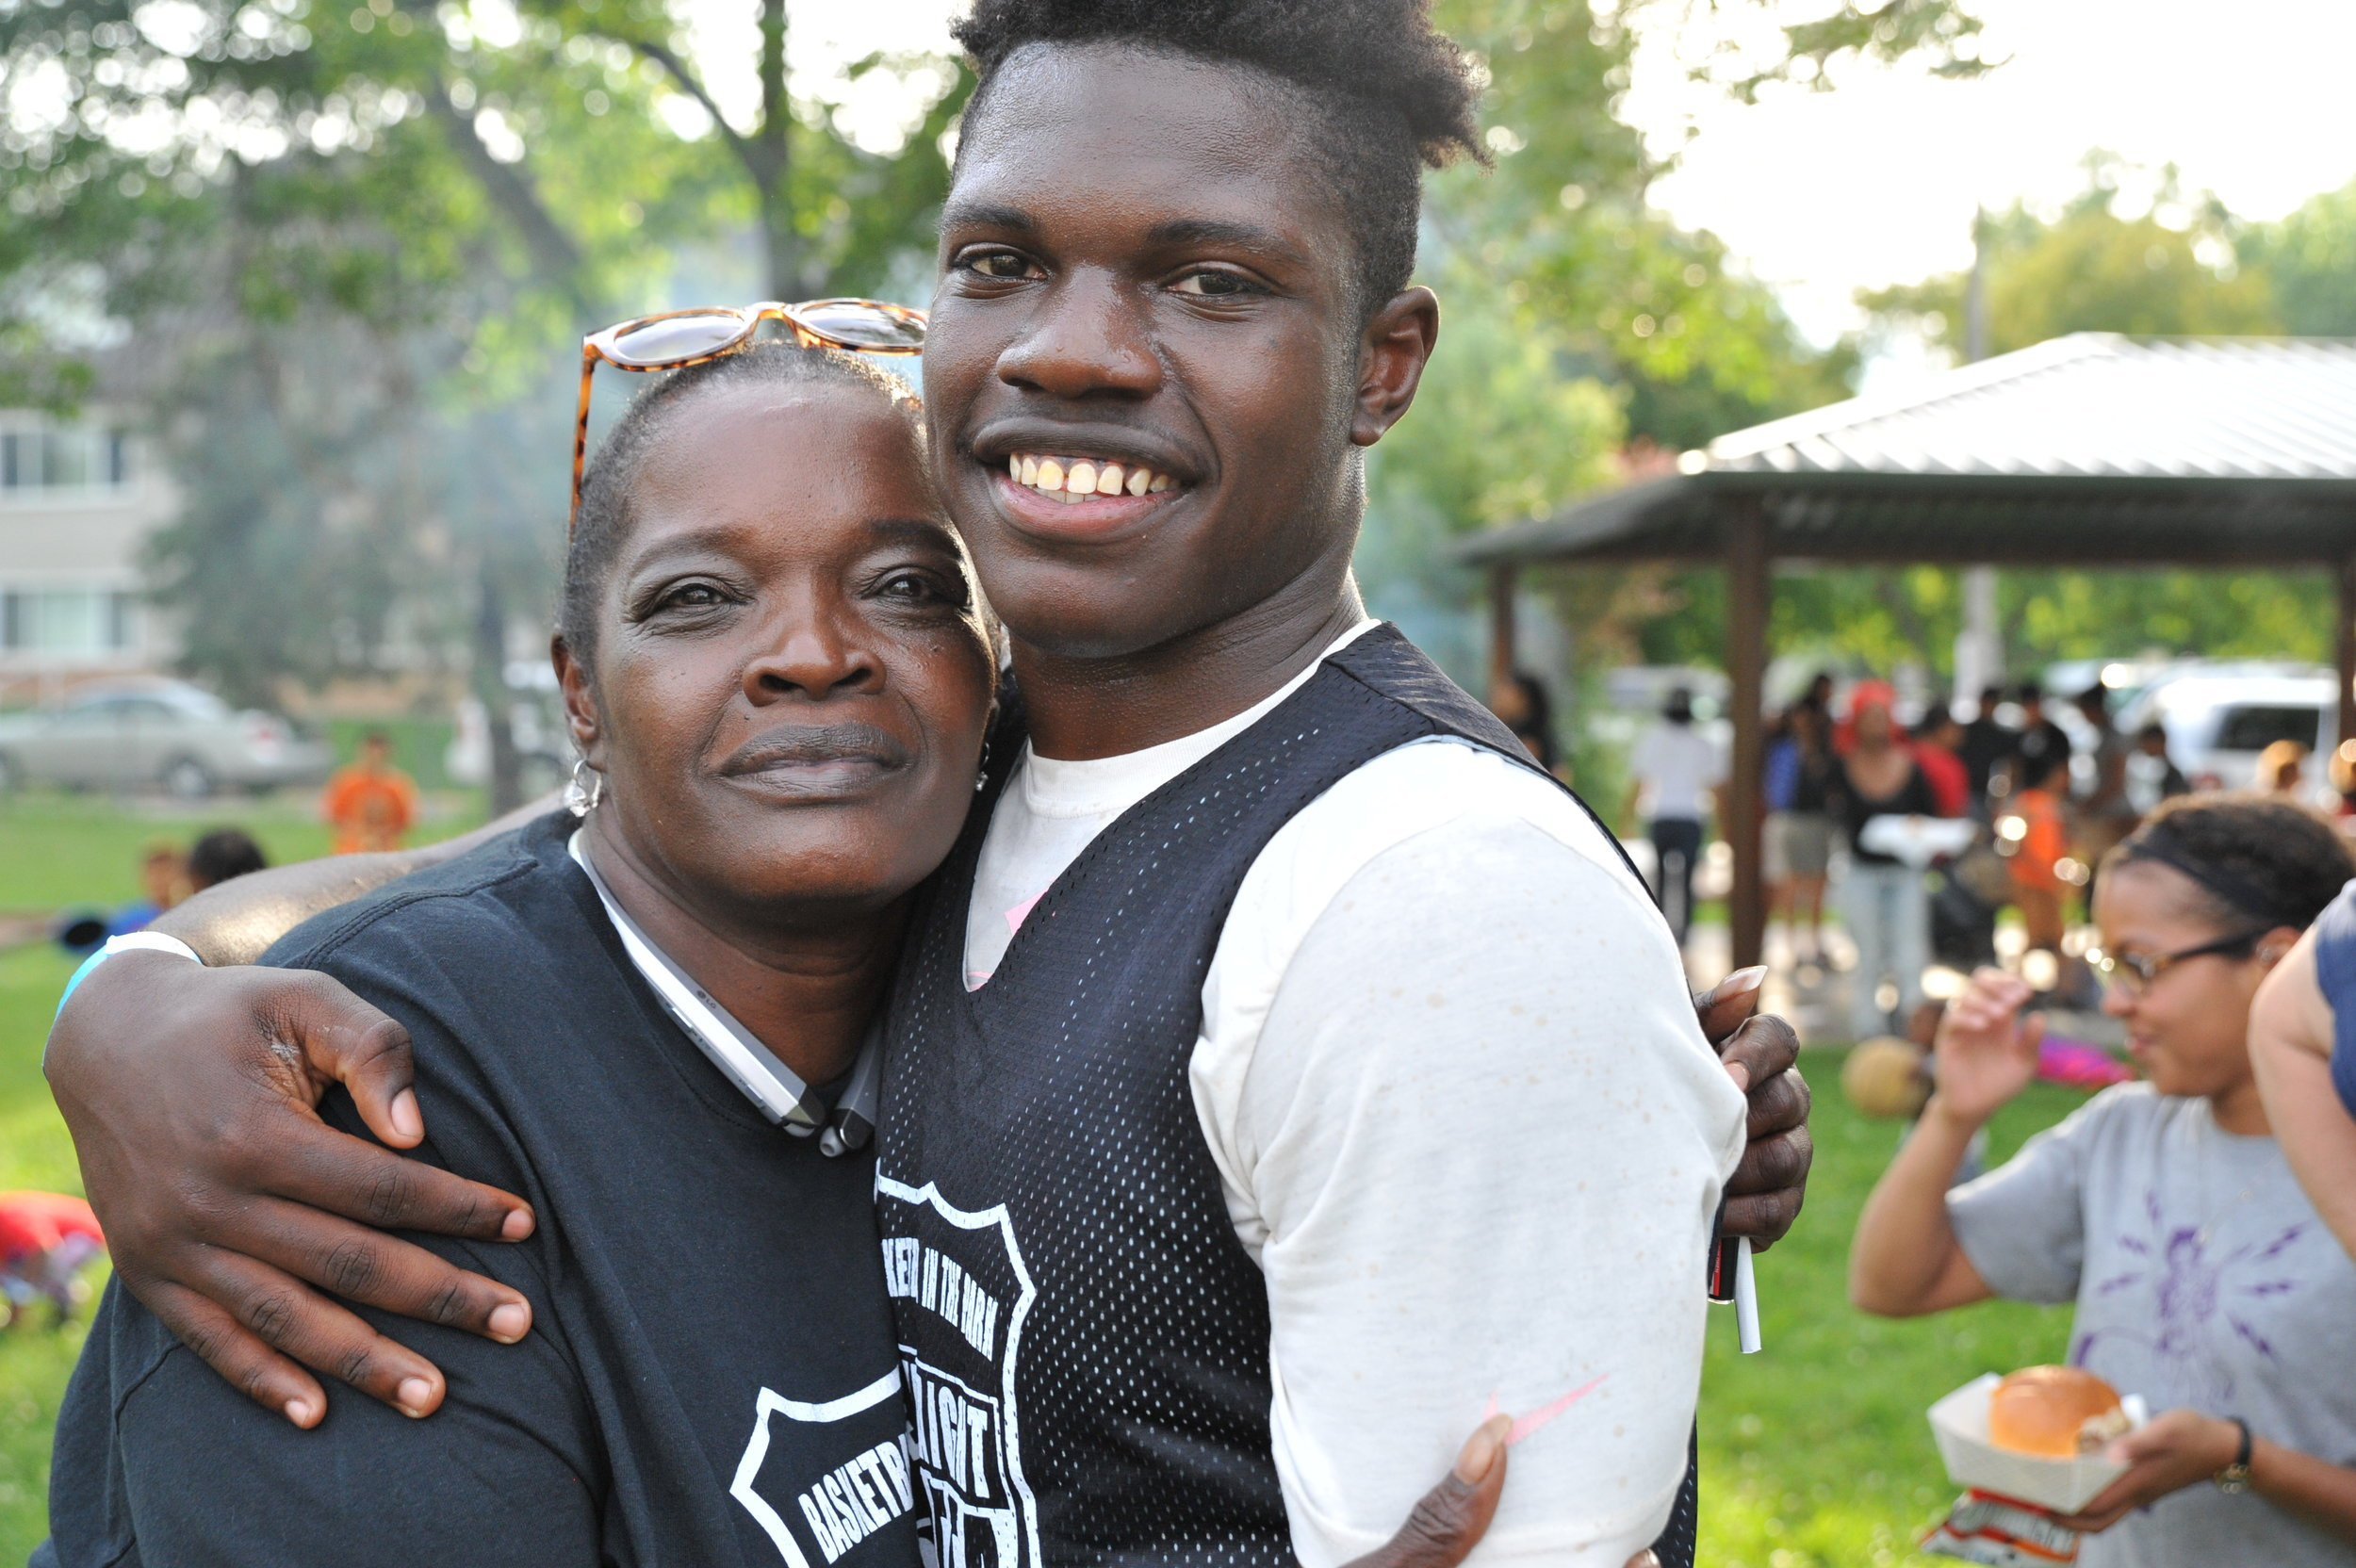 Yolanda and her son, Akili.